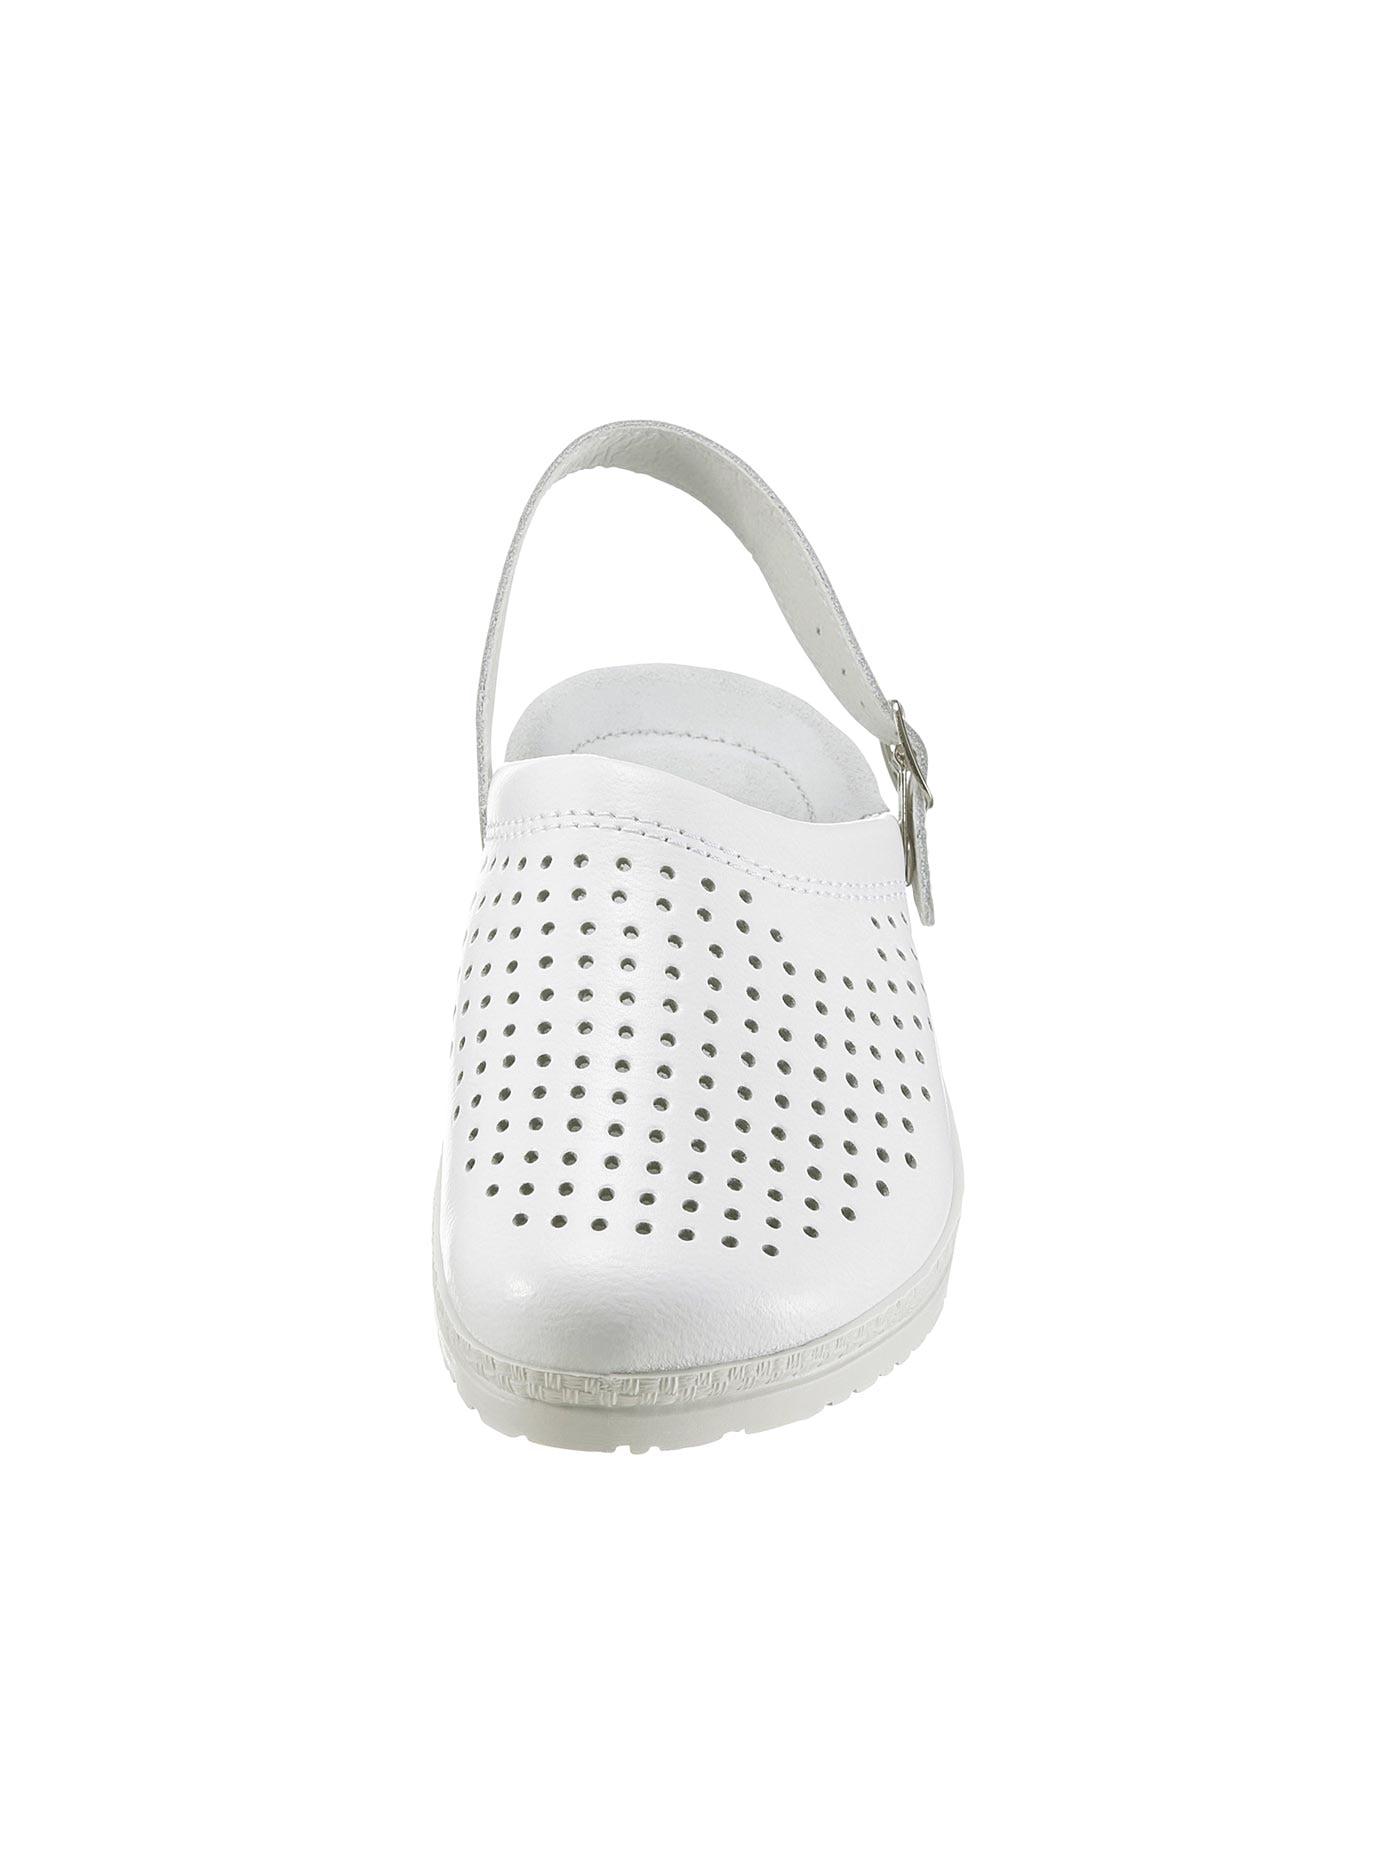 Rohde Pantoffel mit verstellbarer Schließe | Schuhe > Hausschuhe > Pantoffeln | Weiß | Leder | Rohde